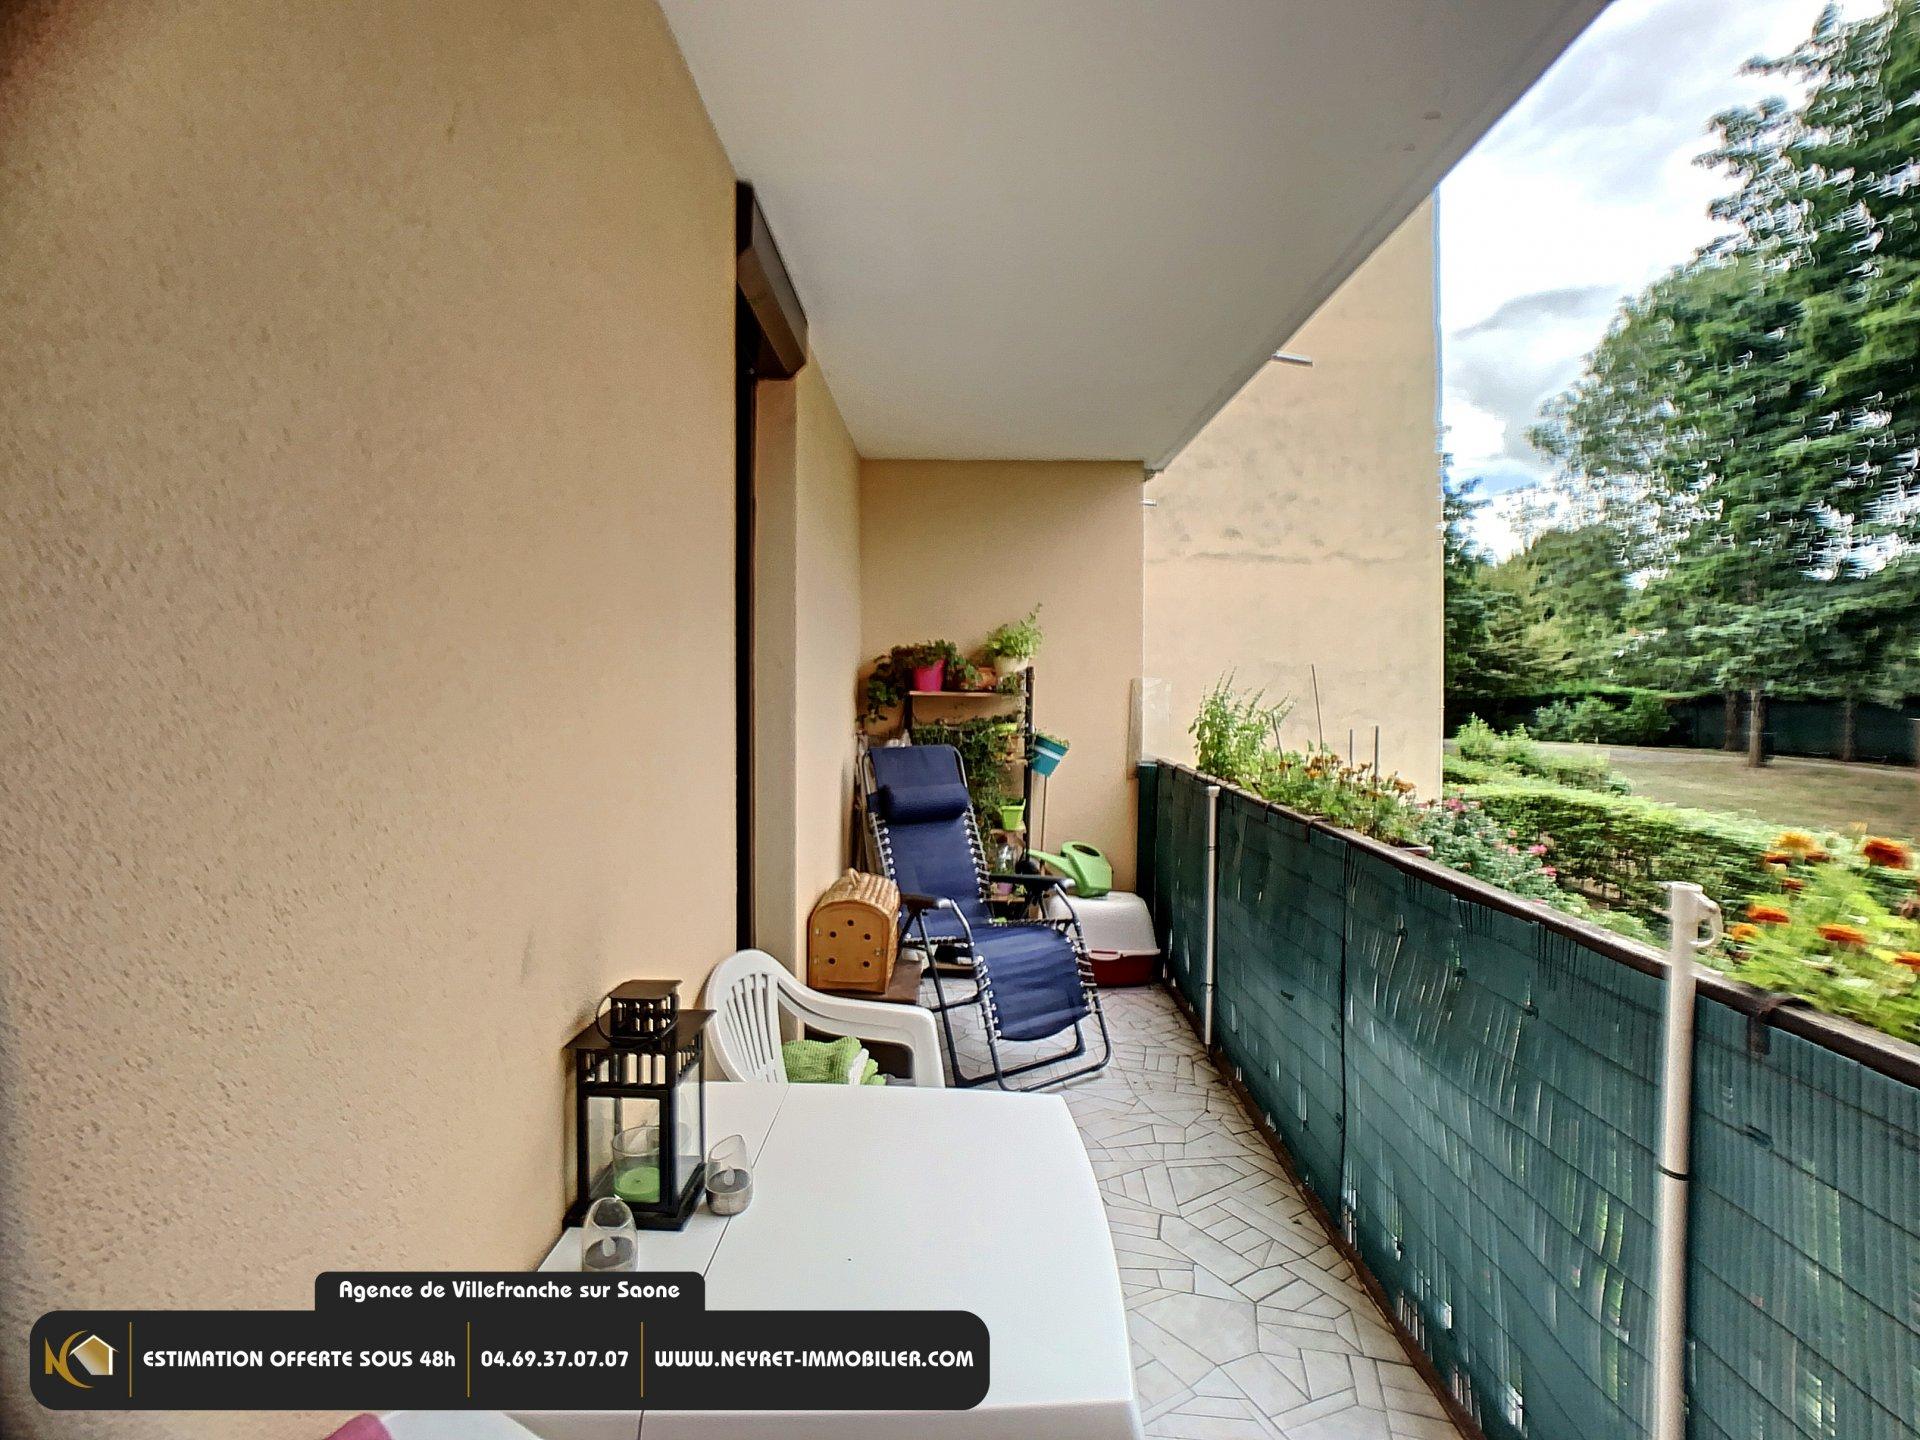 Appartement T4 - Balcon - Gleizé